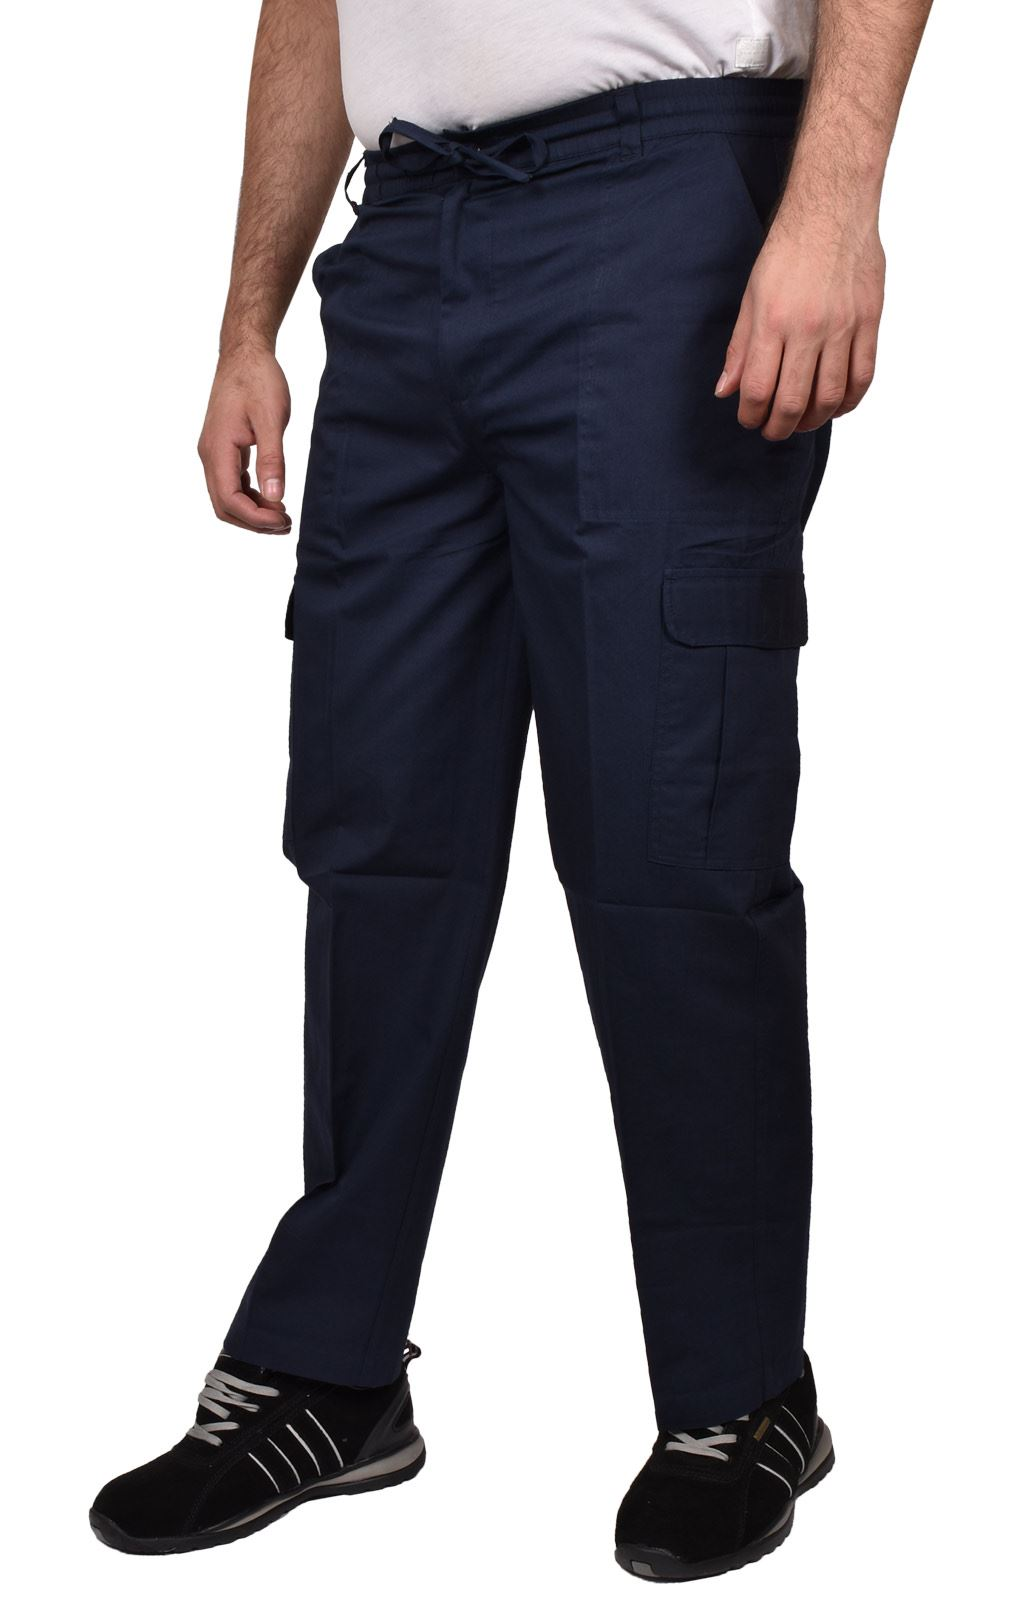 Para-Hombre-De-Carga-Combate-Pantalones-De-Trabajo-Bolsillos-Patrulla-Tactico-Pro-Algodon-Pantalones miniatura 11